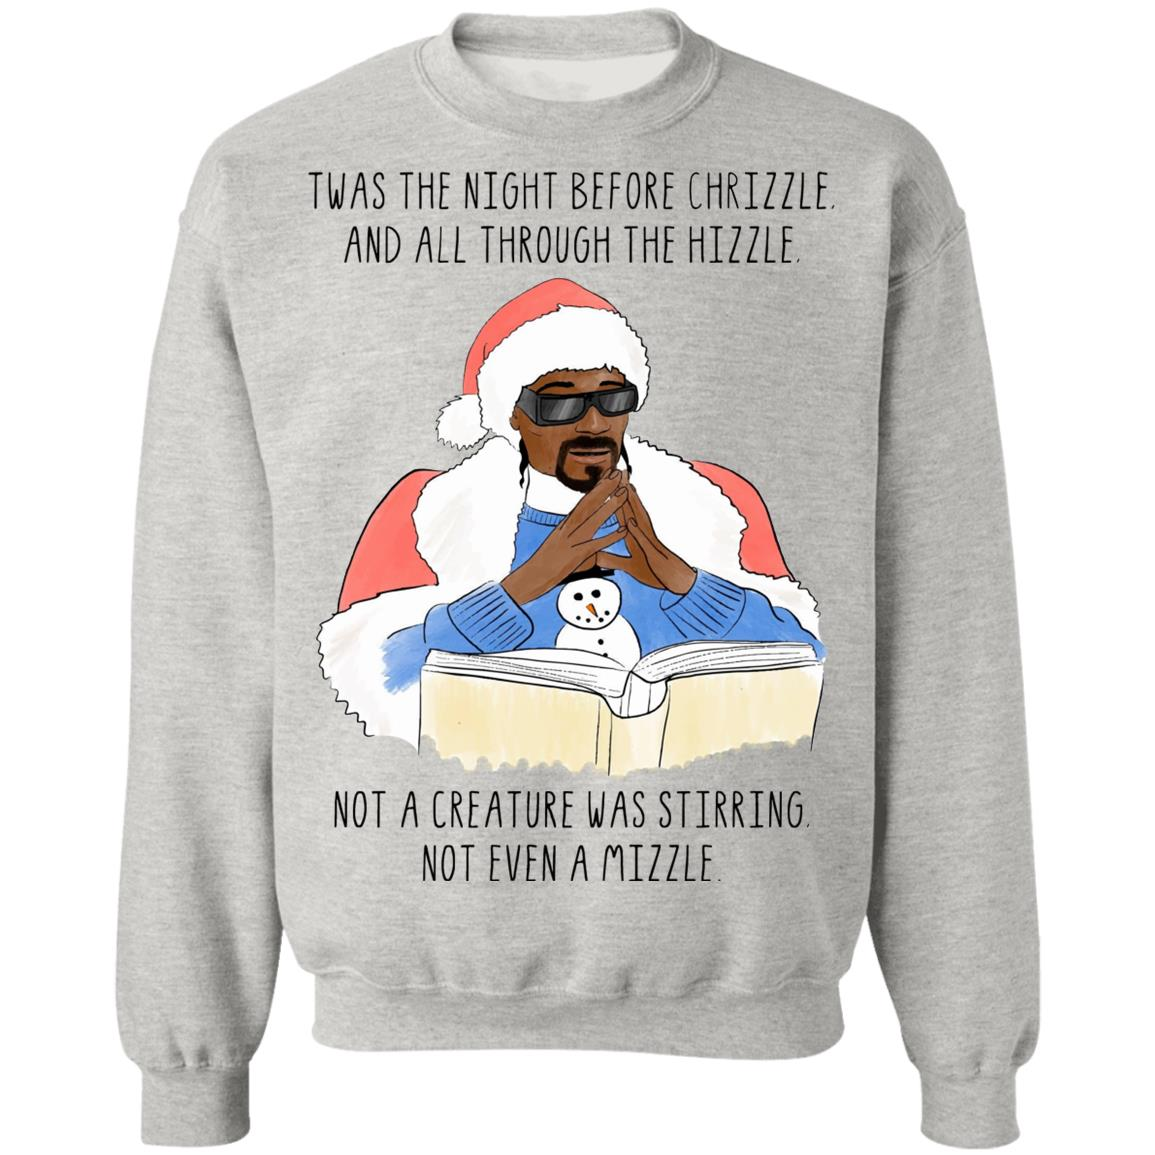 Christmas Sweatshirt /'Twas the Nizzle before Chrismizzle Ugly Sweater Gift Night before Christmas Shirt Funny Christmas Sweater